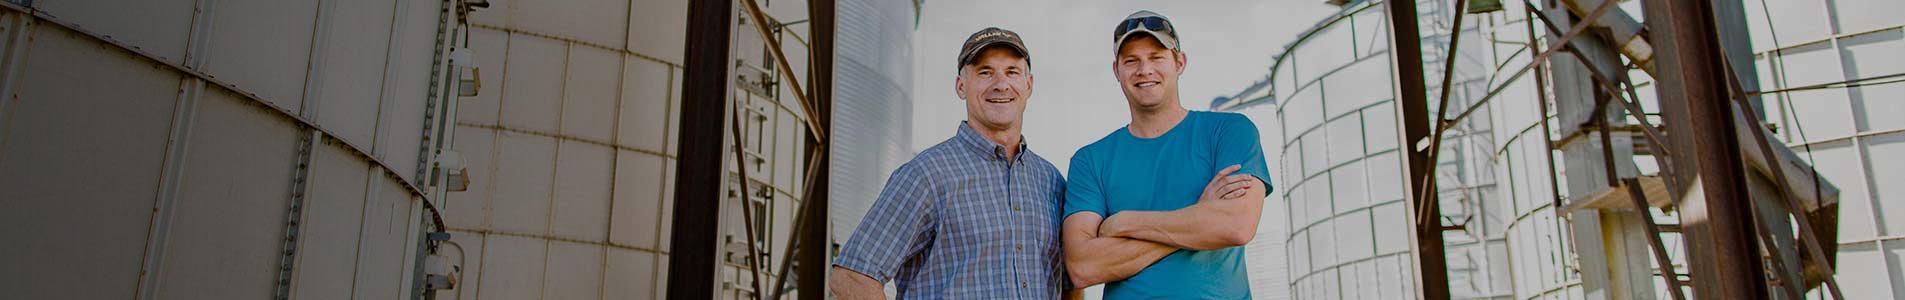 growers - farmers - testimonials